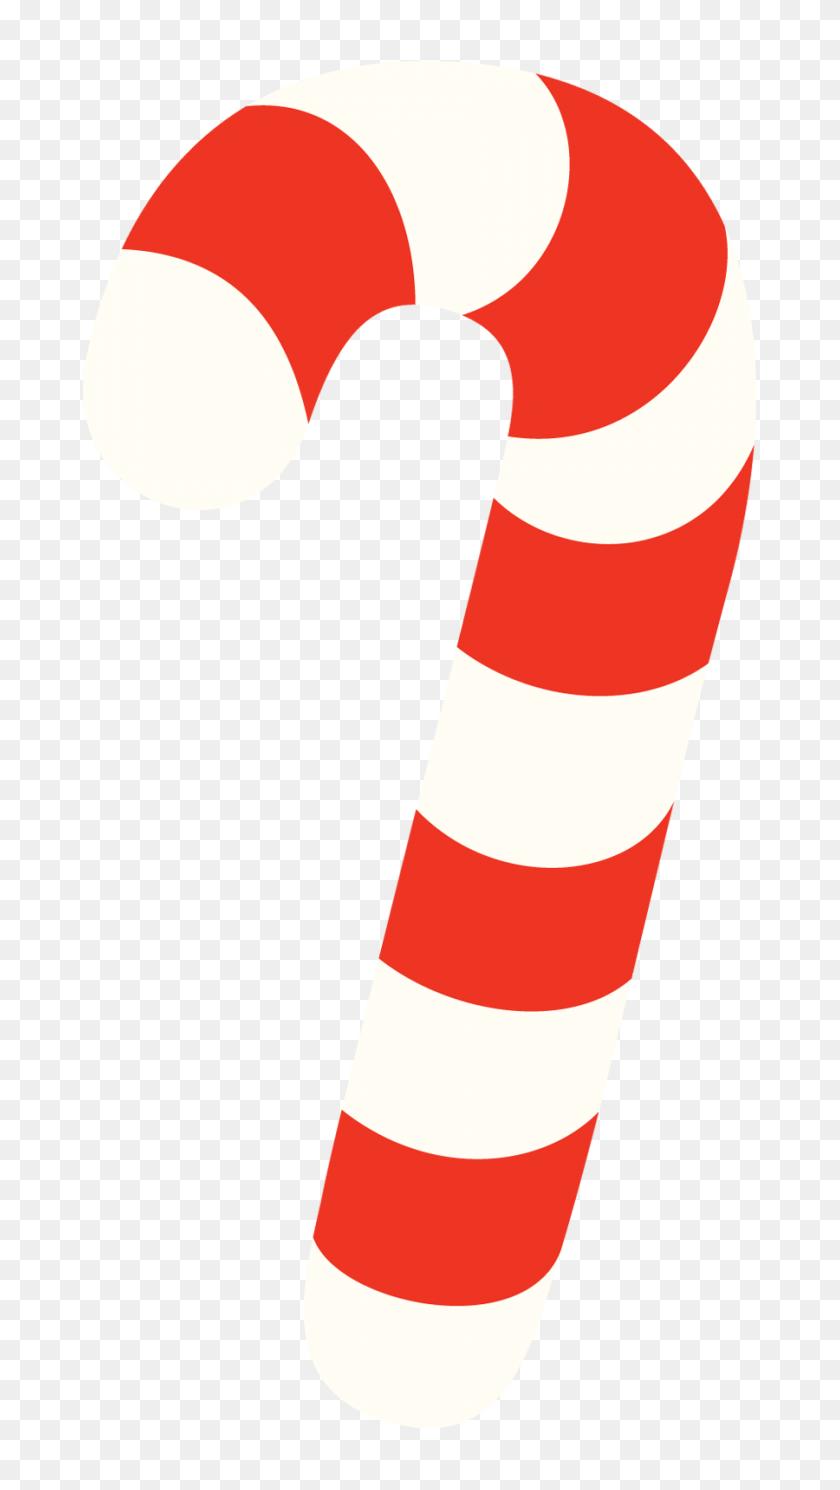 Candy Cane Clipart Divider - PNG Divider